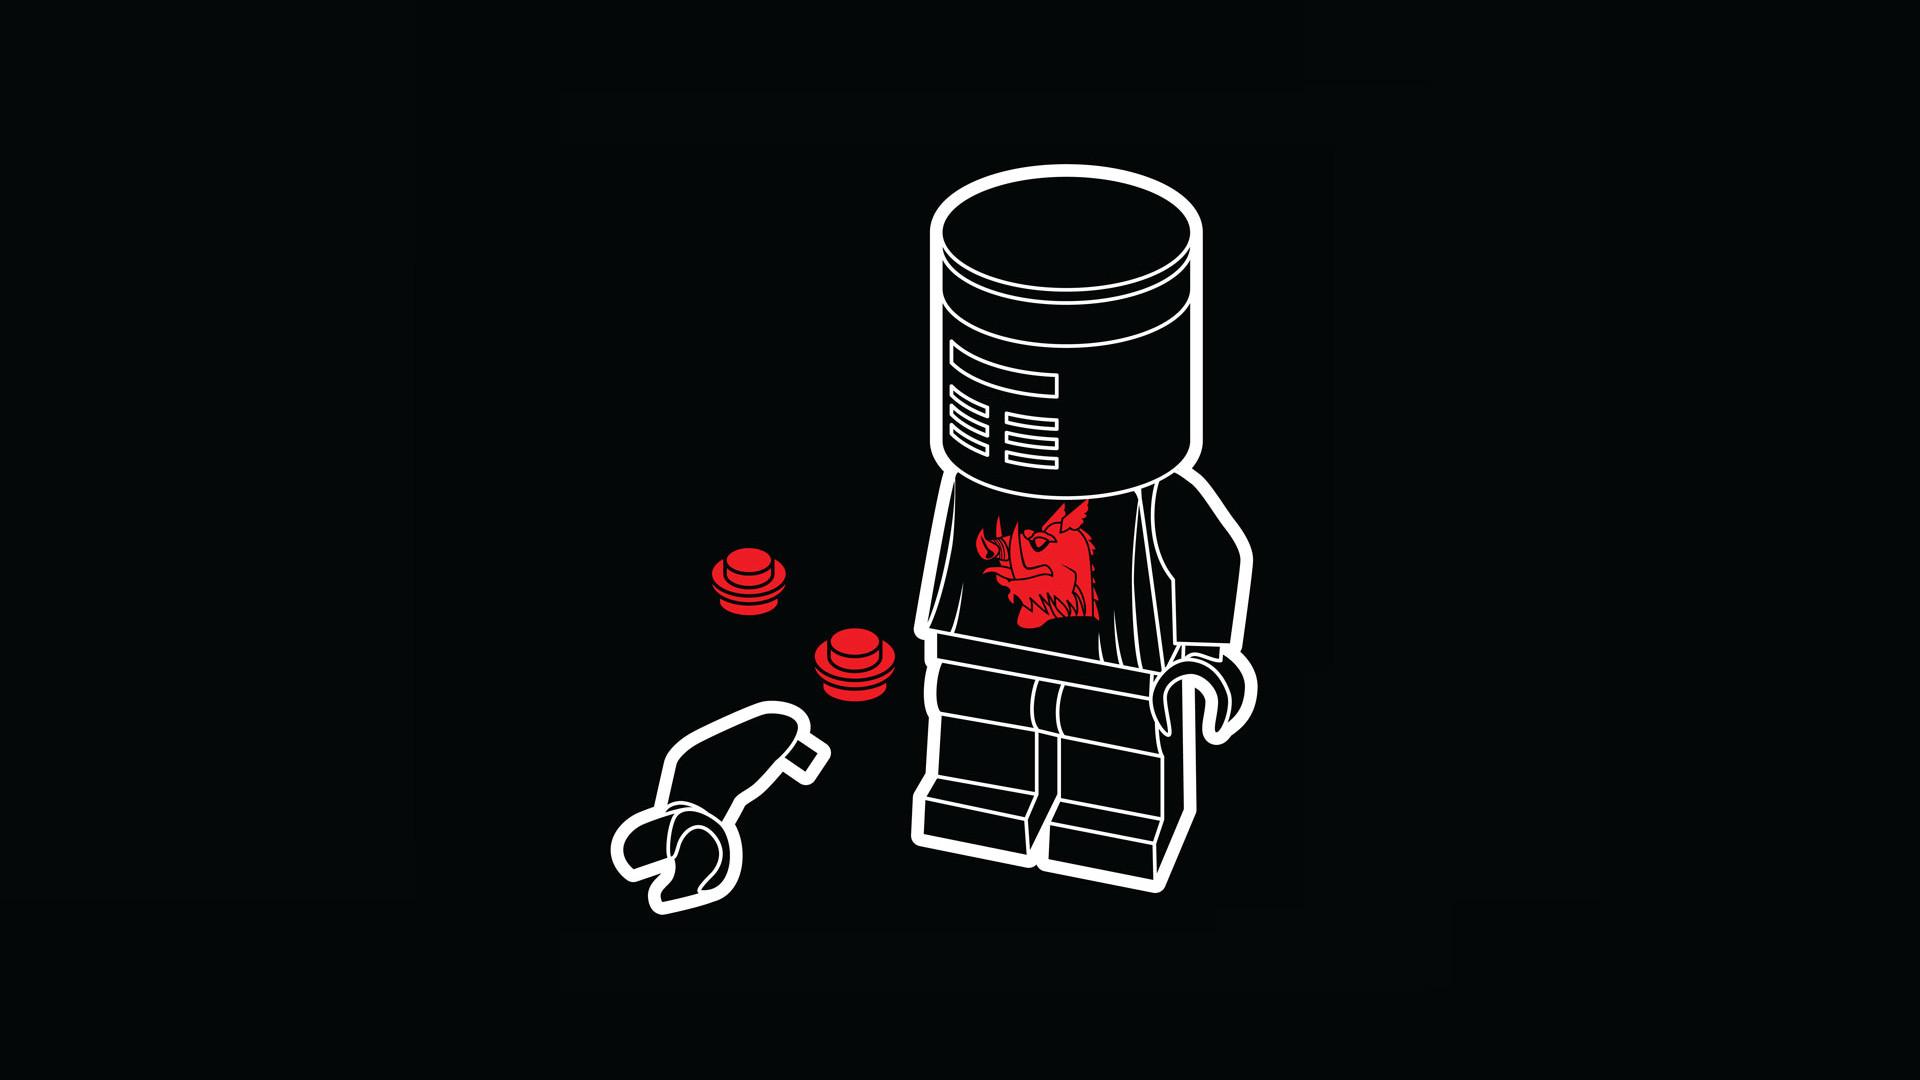 Products – Lego Monty Python Black Knight Humor Movie Wallpaper